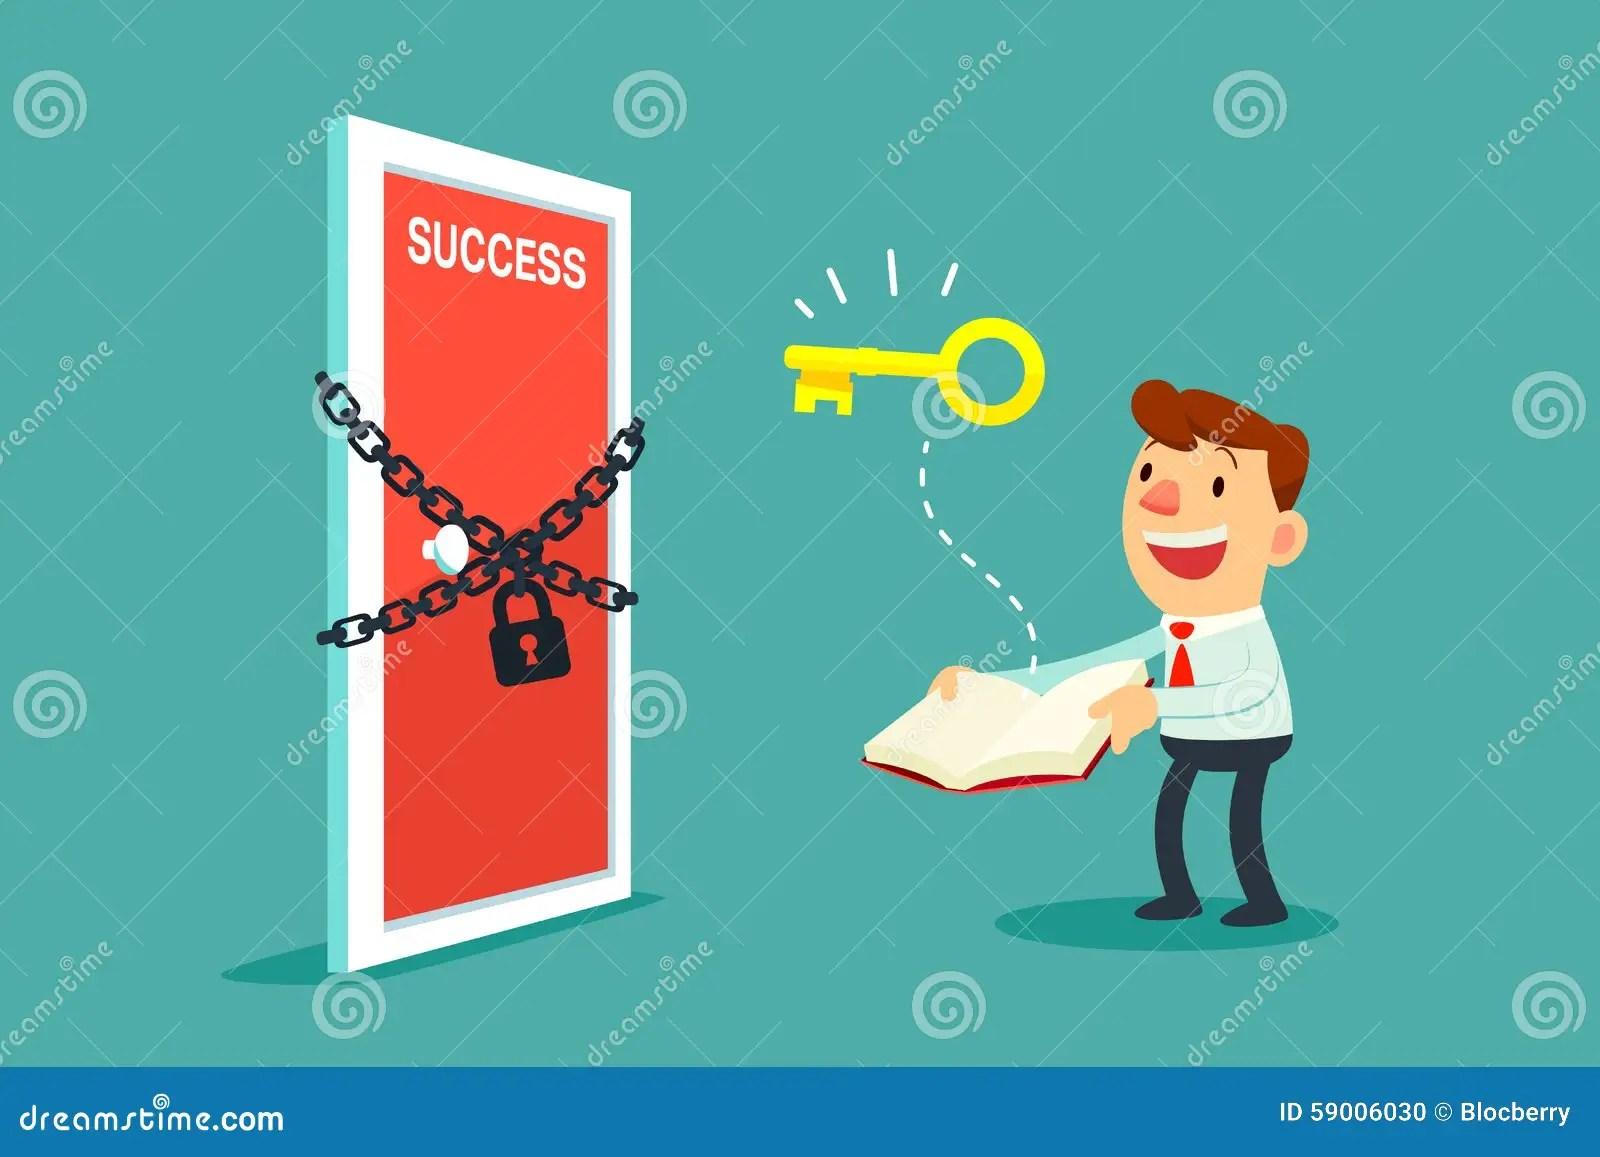 Businessman Open A Book To Unlock Door To Success Stock Vector - Illustration of cartoon. employee: 59006030